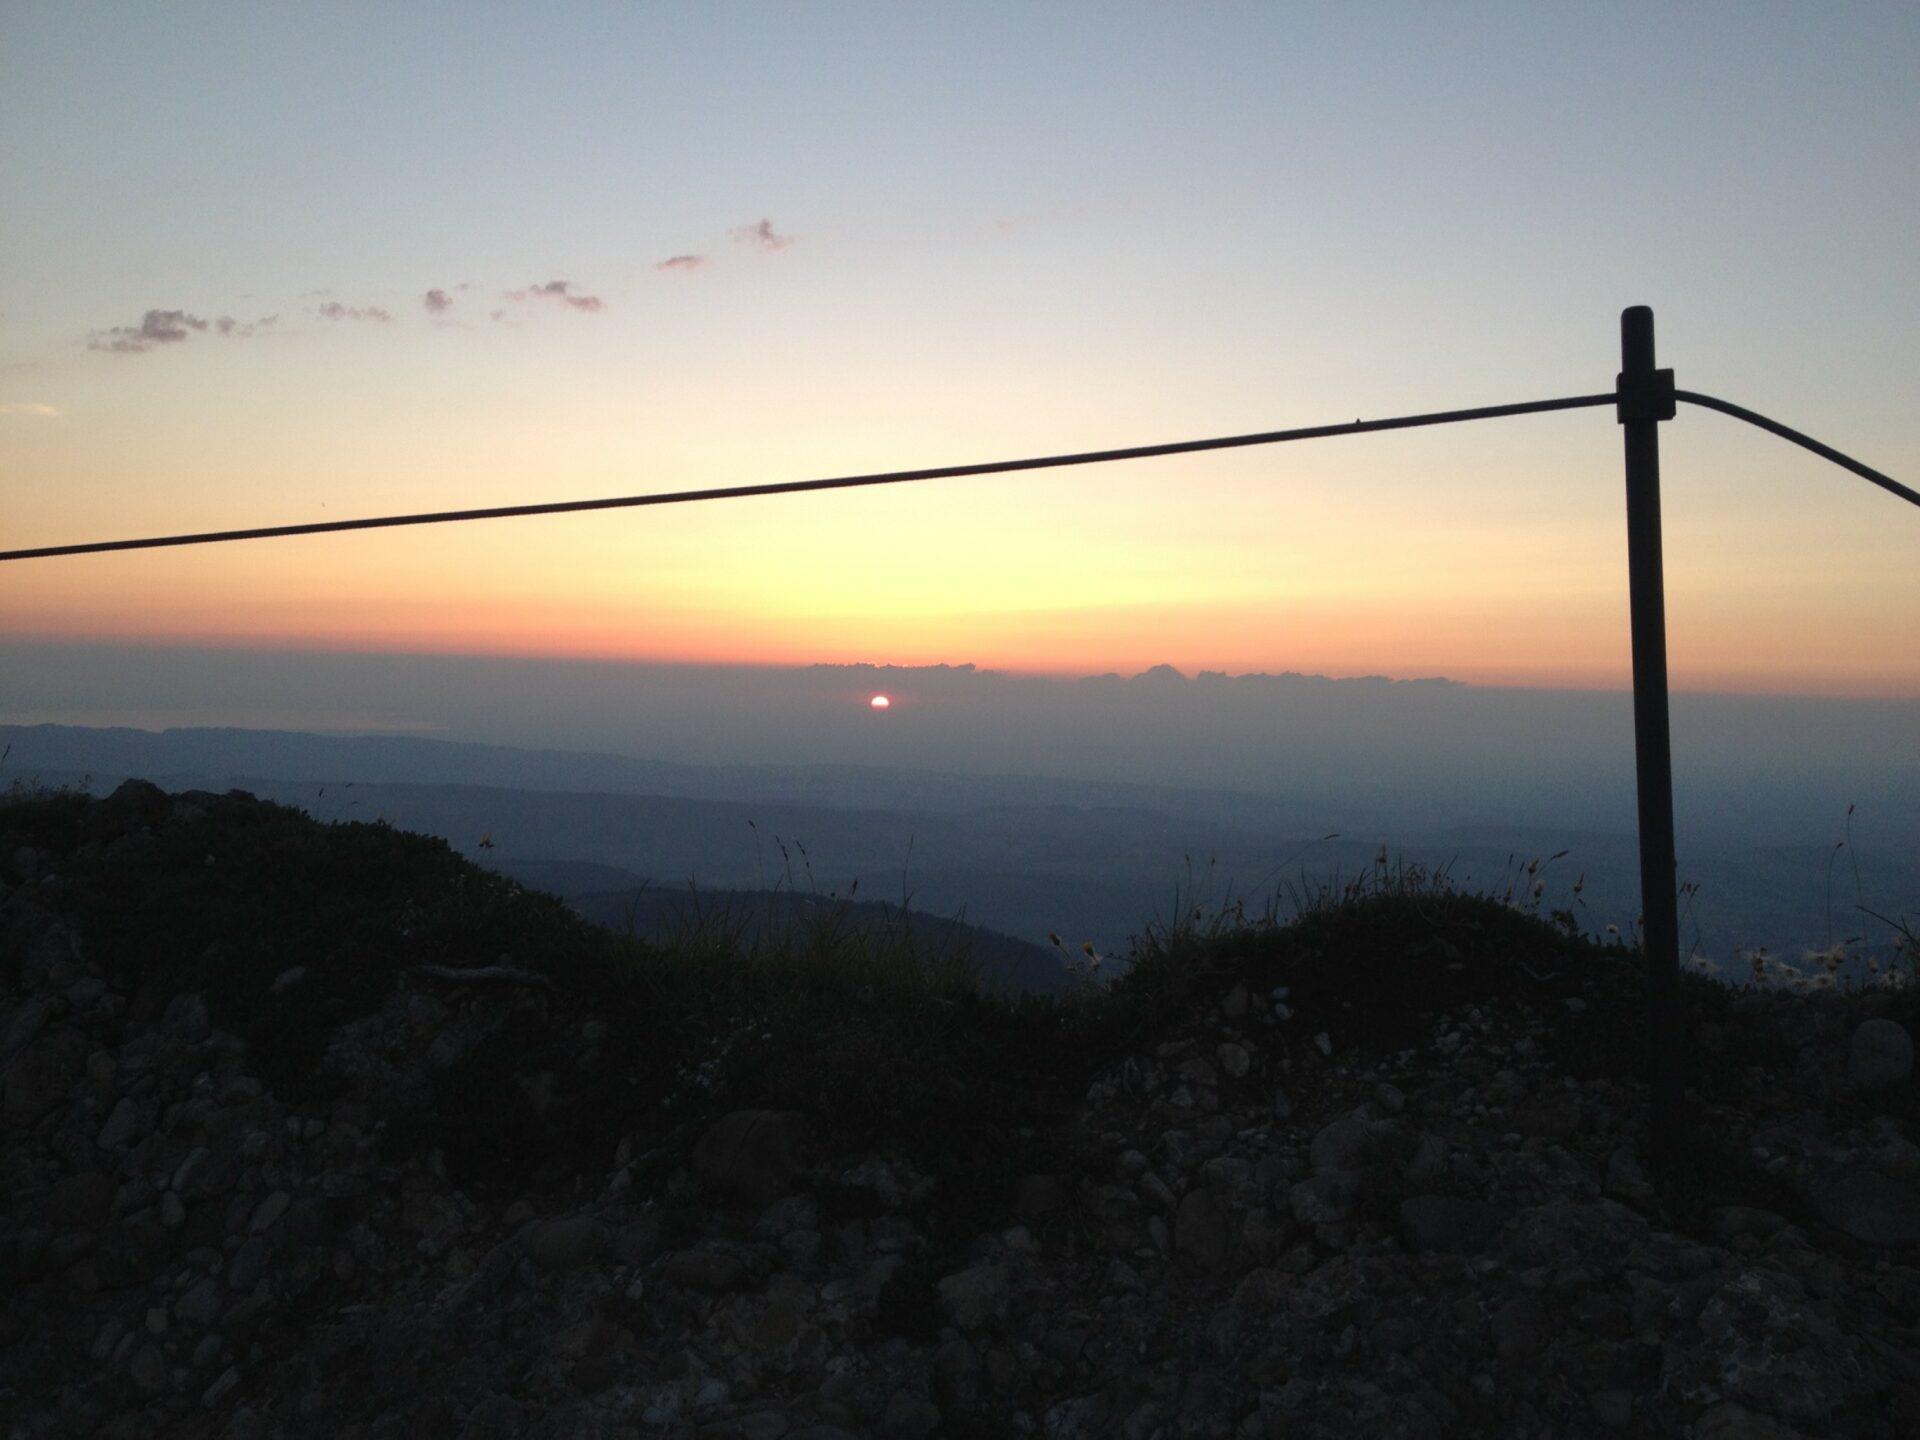 Sonnenuntergang am Hochgrat